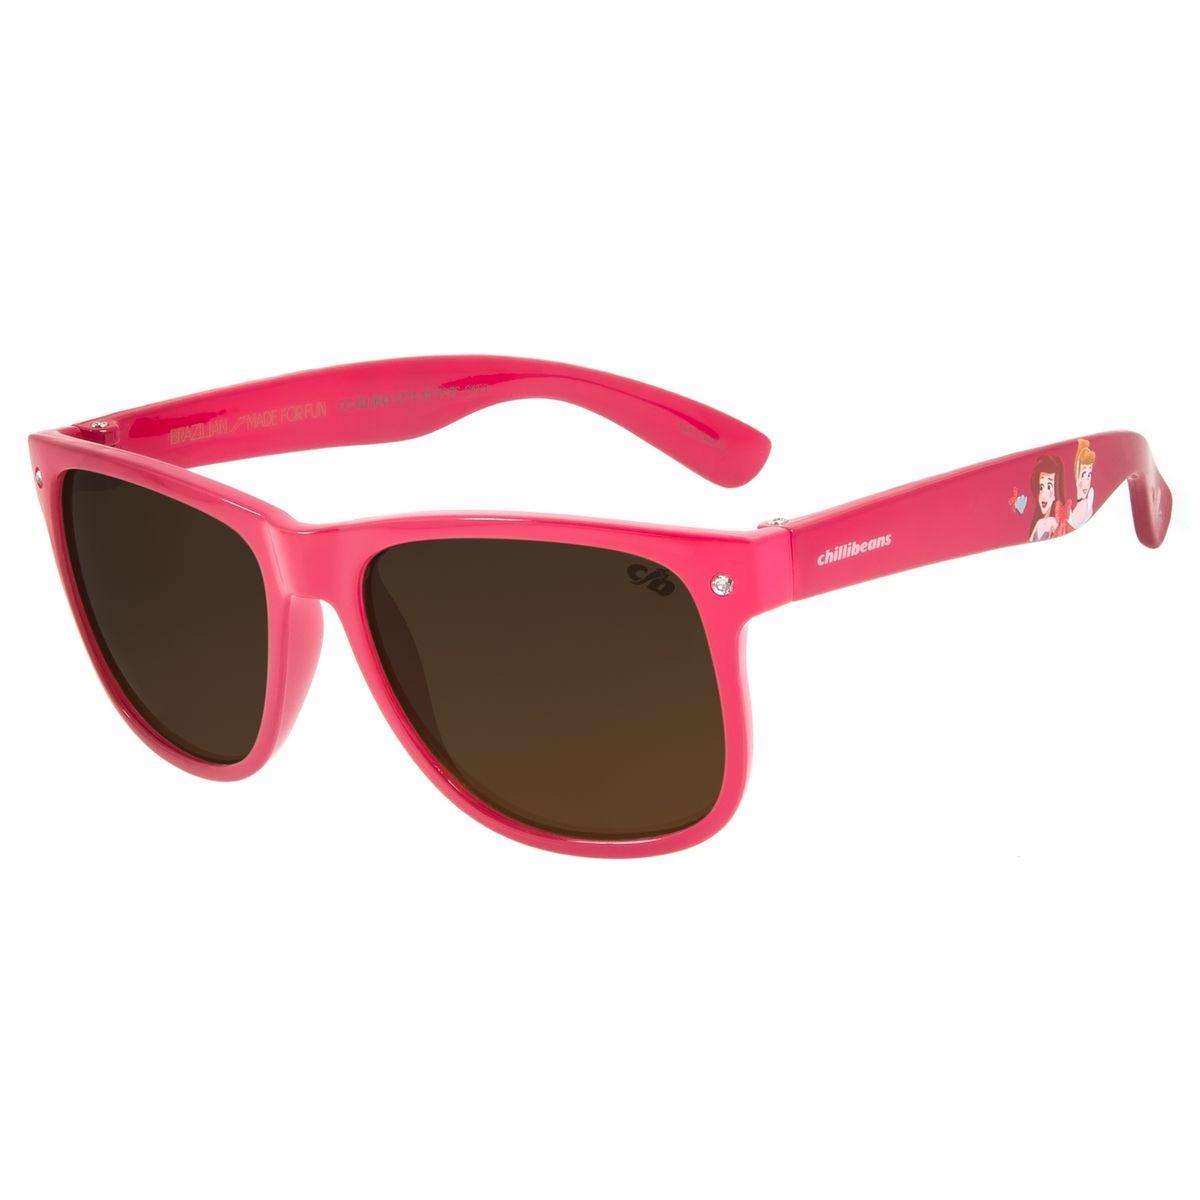 Oculos De Sol Infantil Disney Princesas Rosa Shine Oc Kd 0643 5713